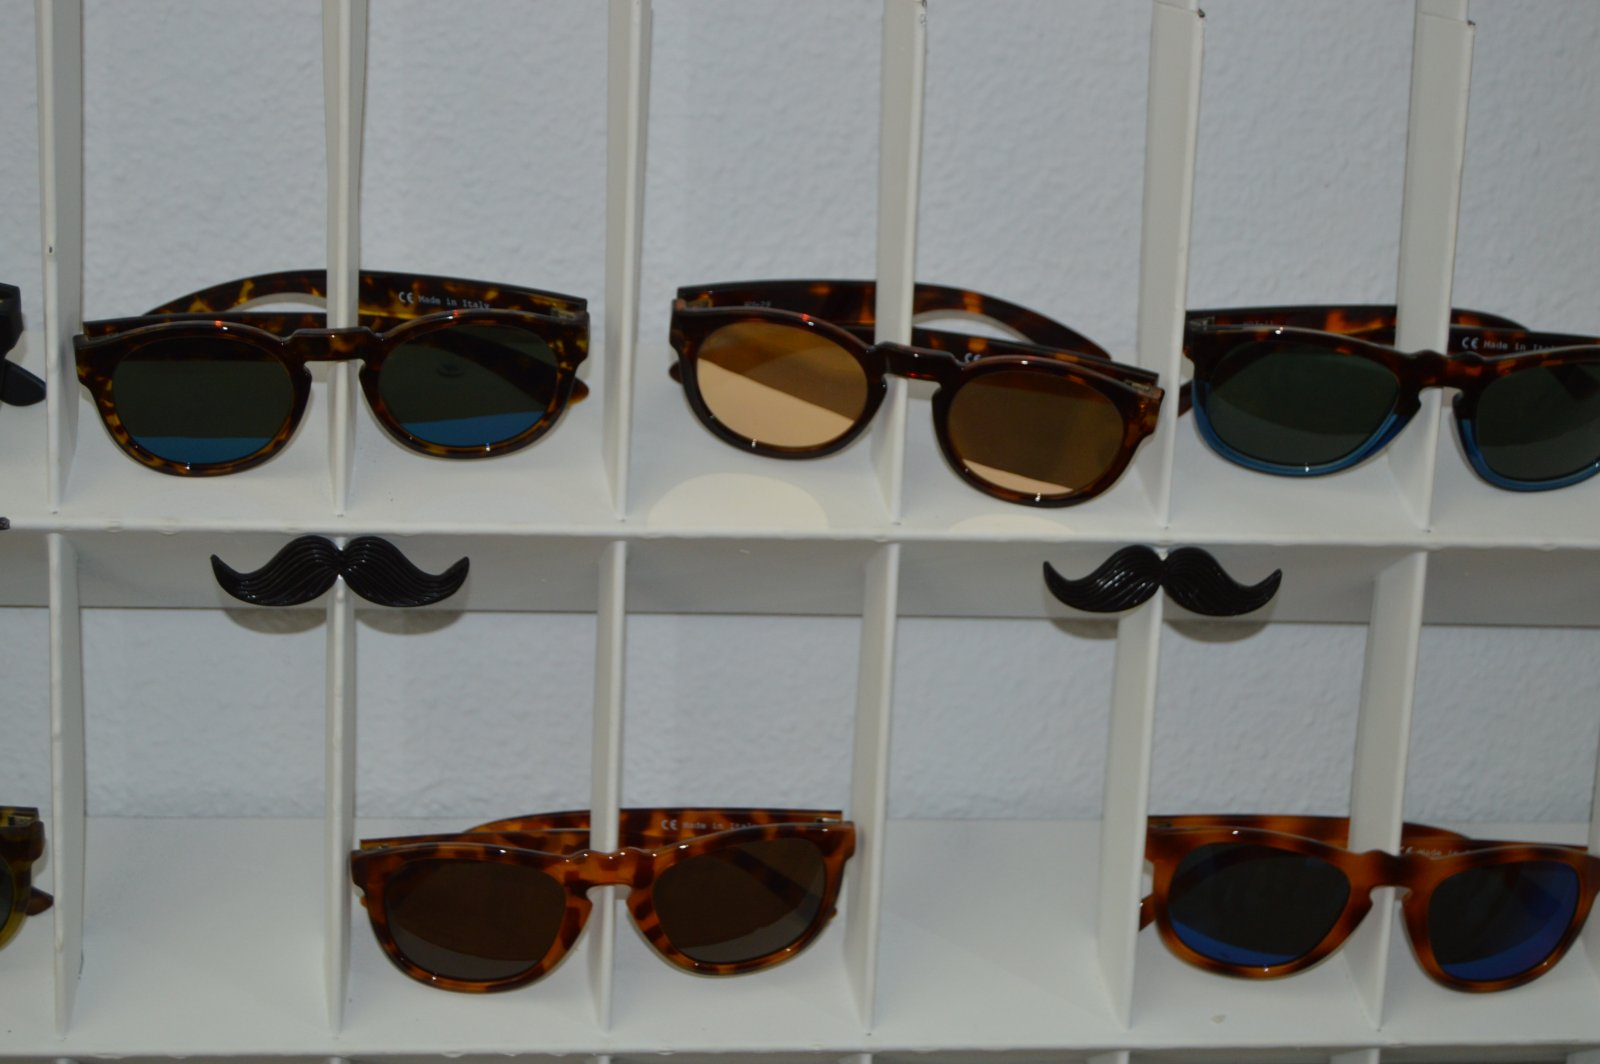 Gafas de sol estilo vintage Mr. Boho.